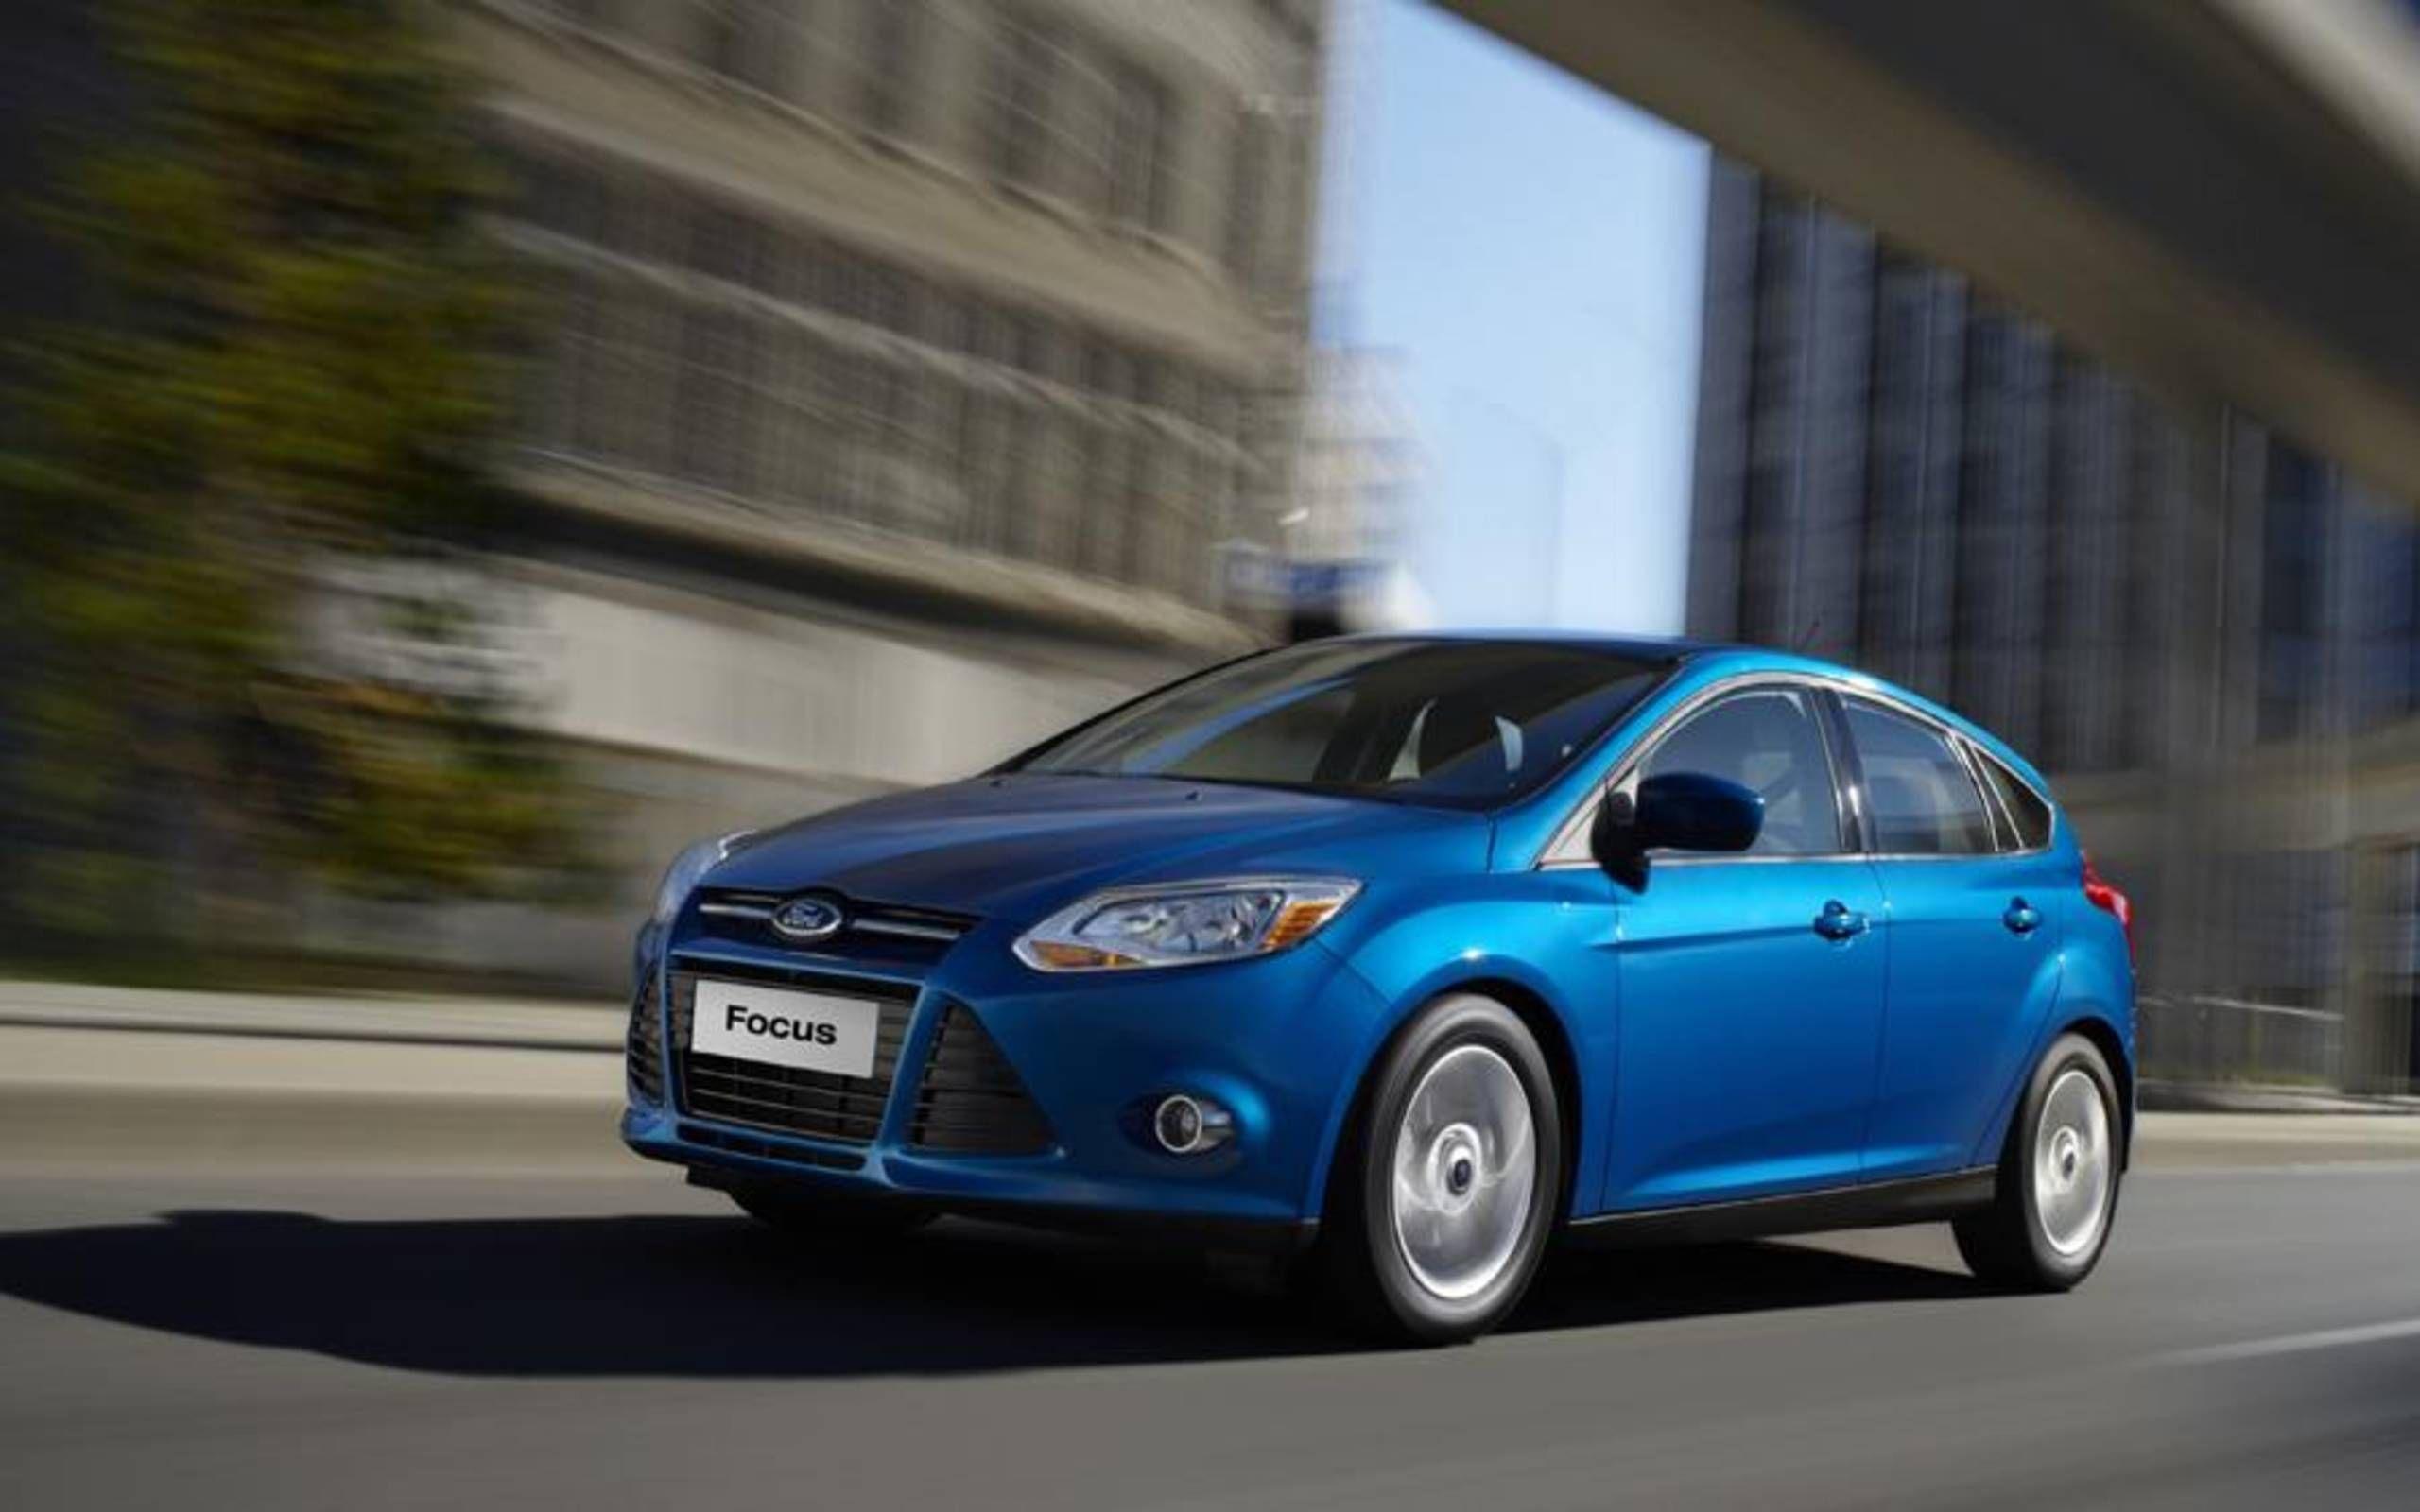 2012 Ford Focus Titanium Hatchback Review Notes